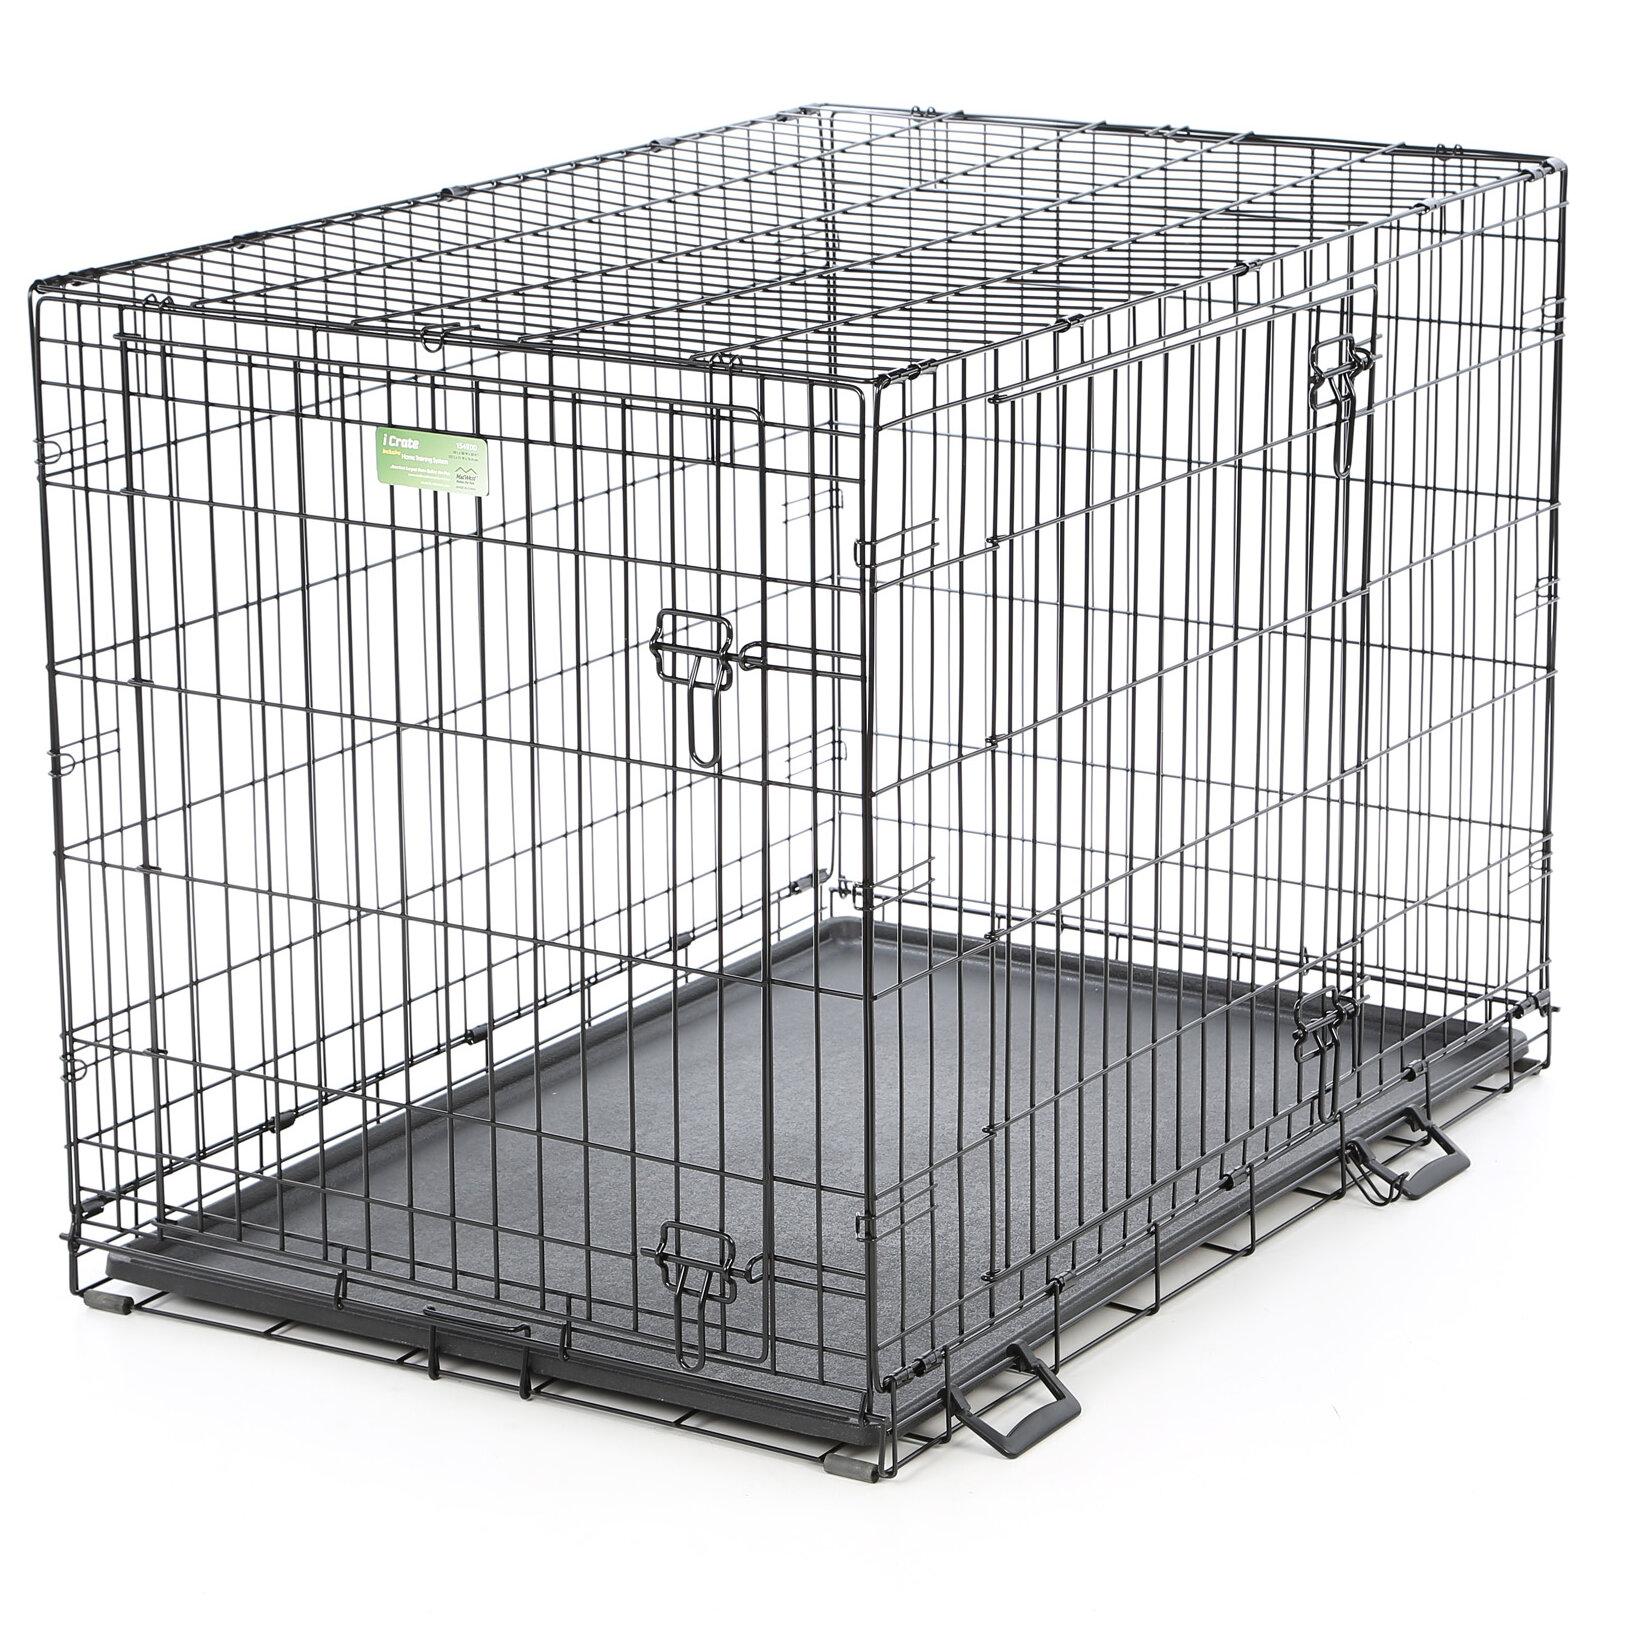 Midwest Homes For Pets Icrate Double Door Pet Crate Reviews Wayfair